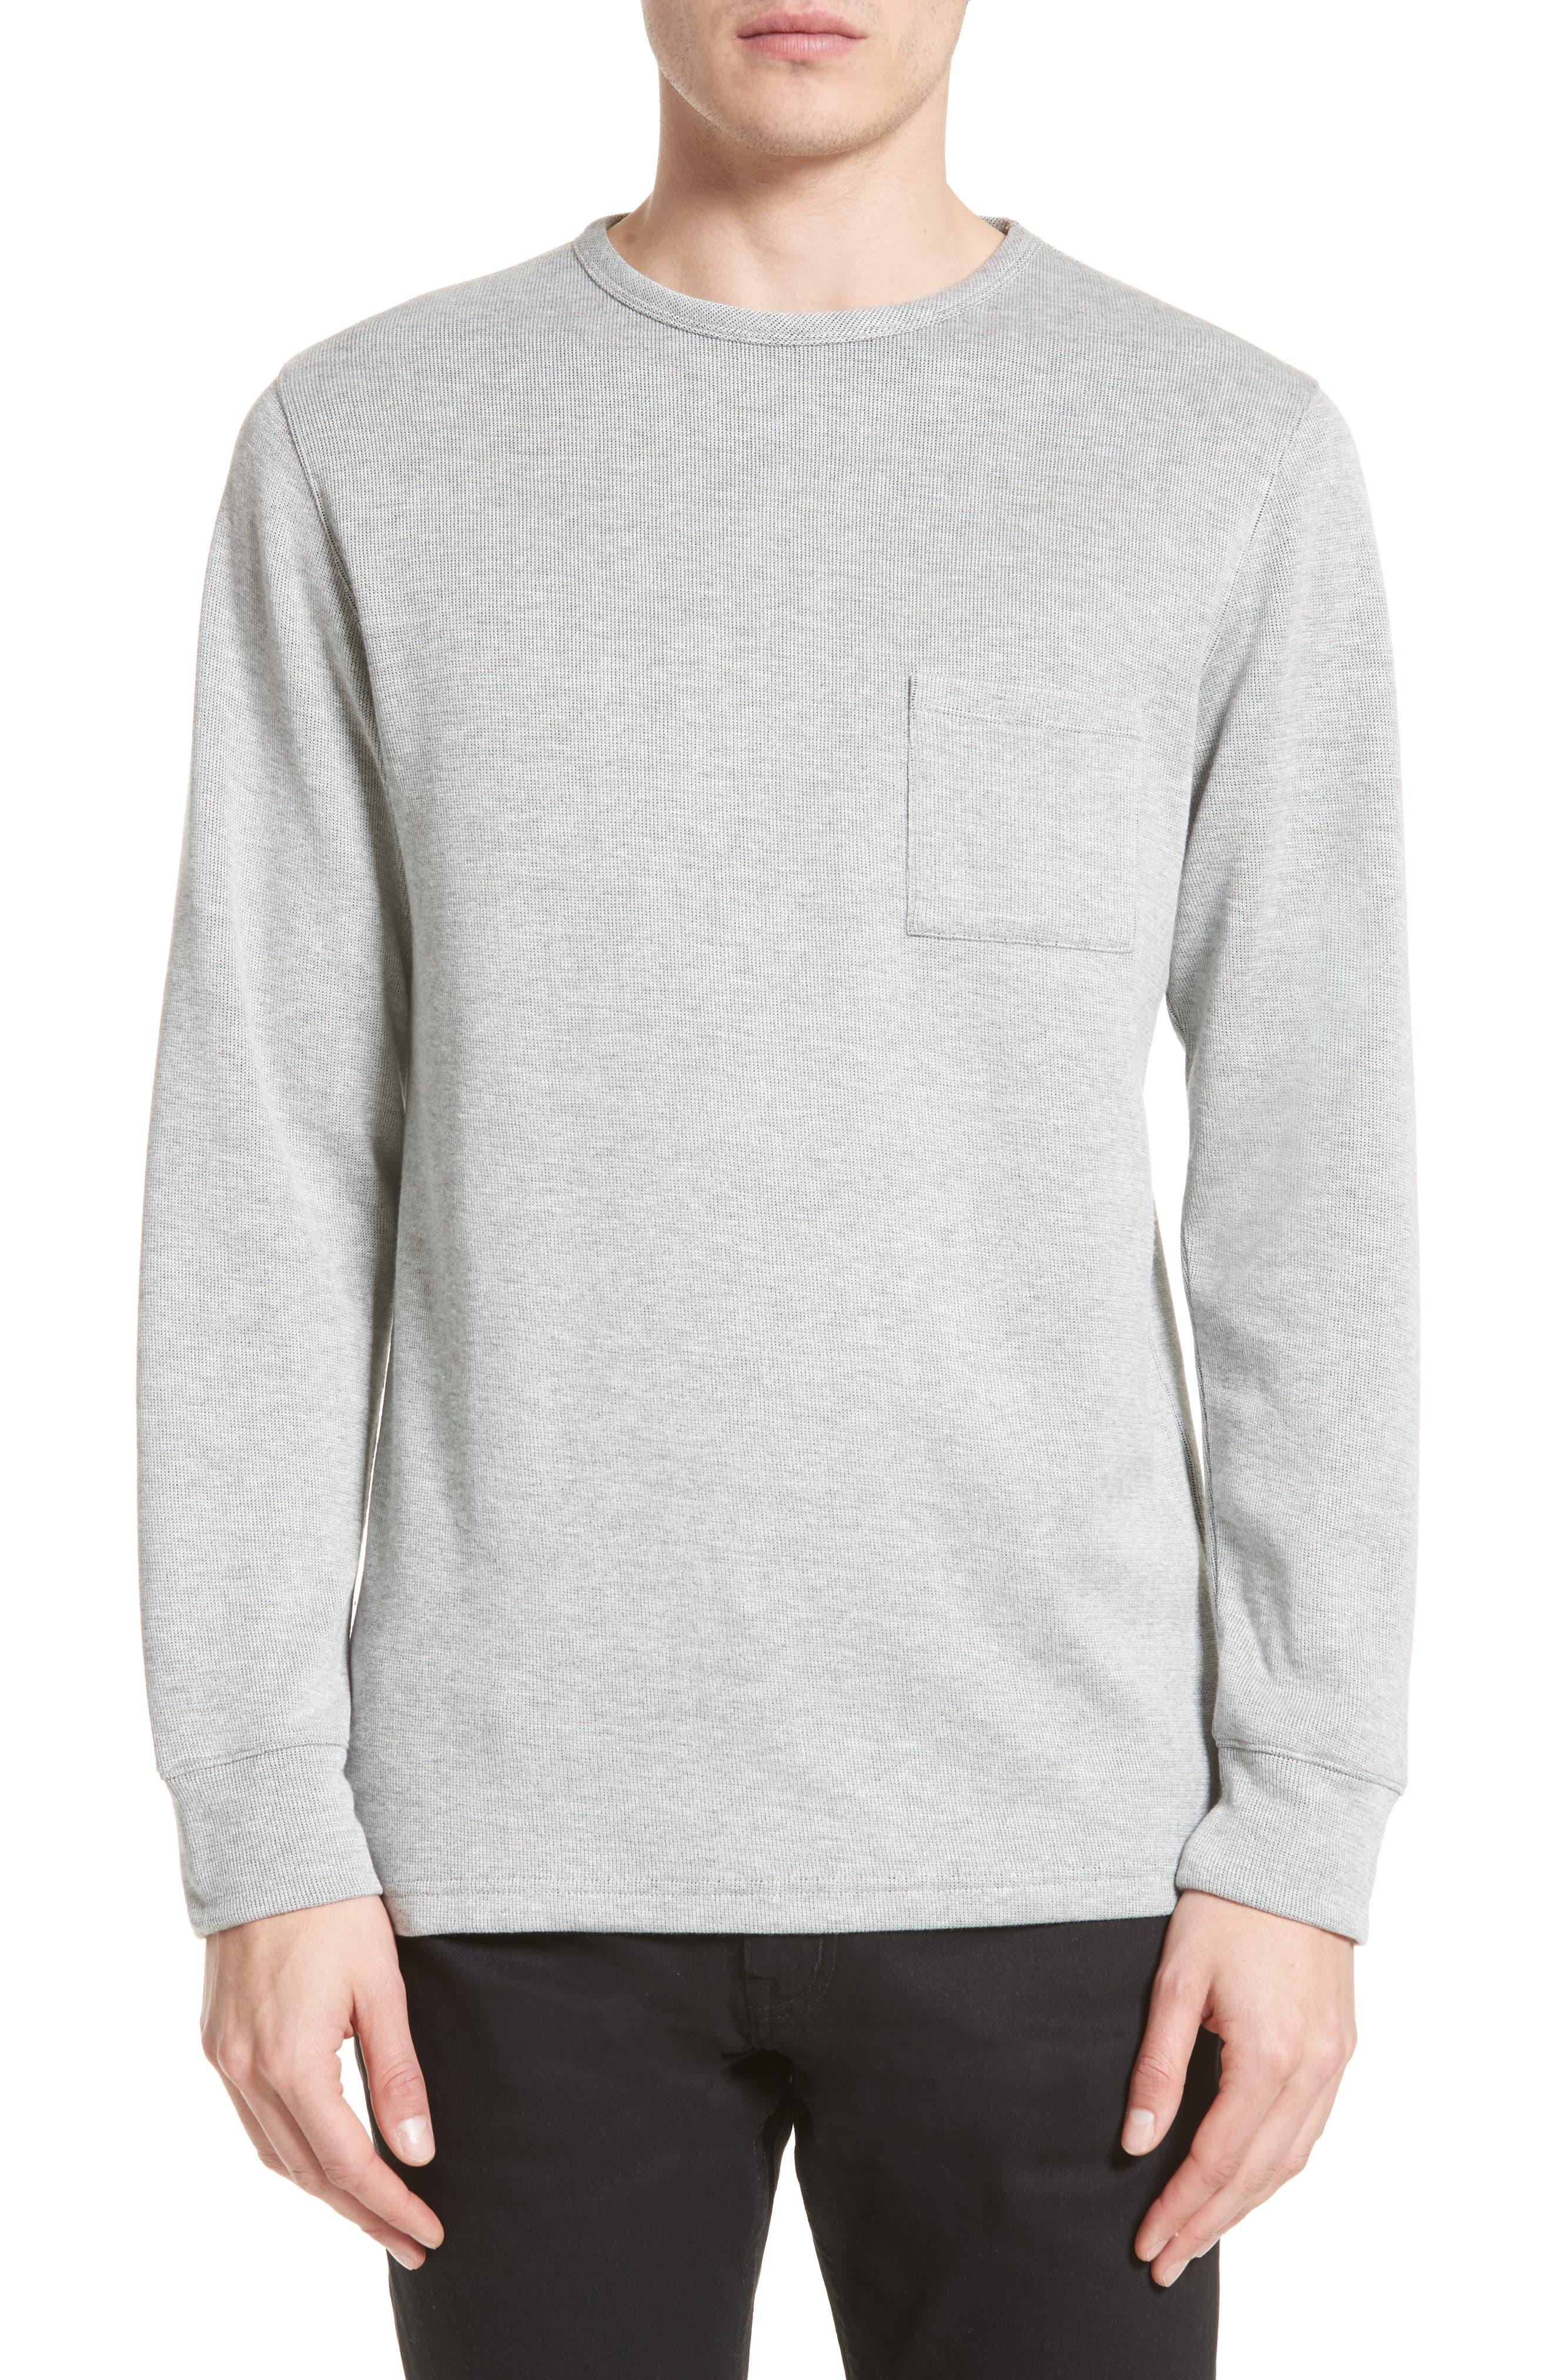 Saturdays NYC James Pocket Sweater